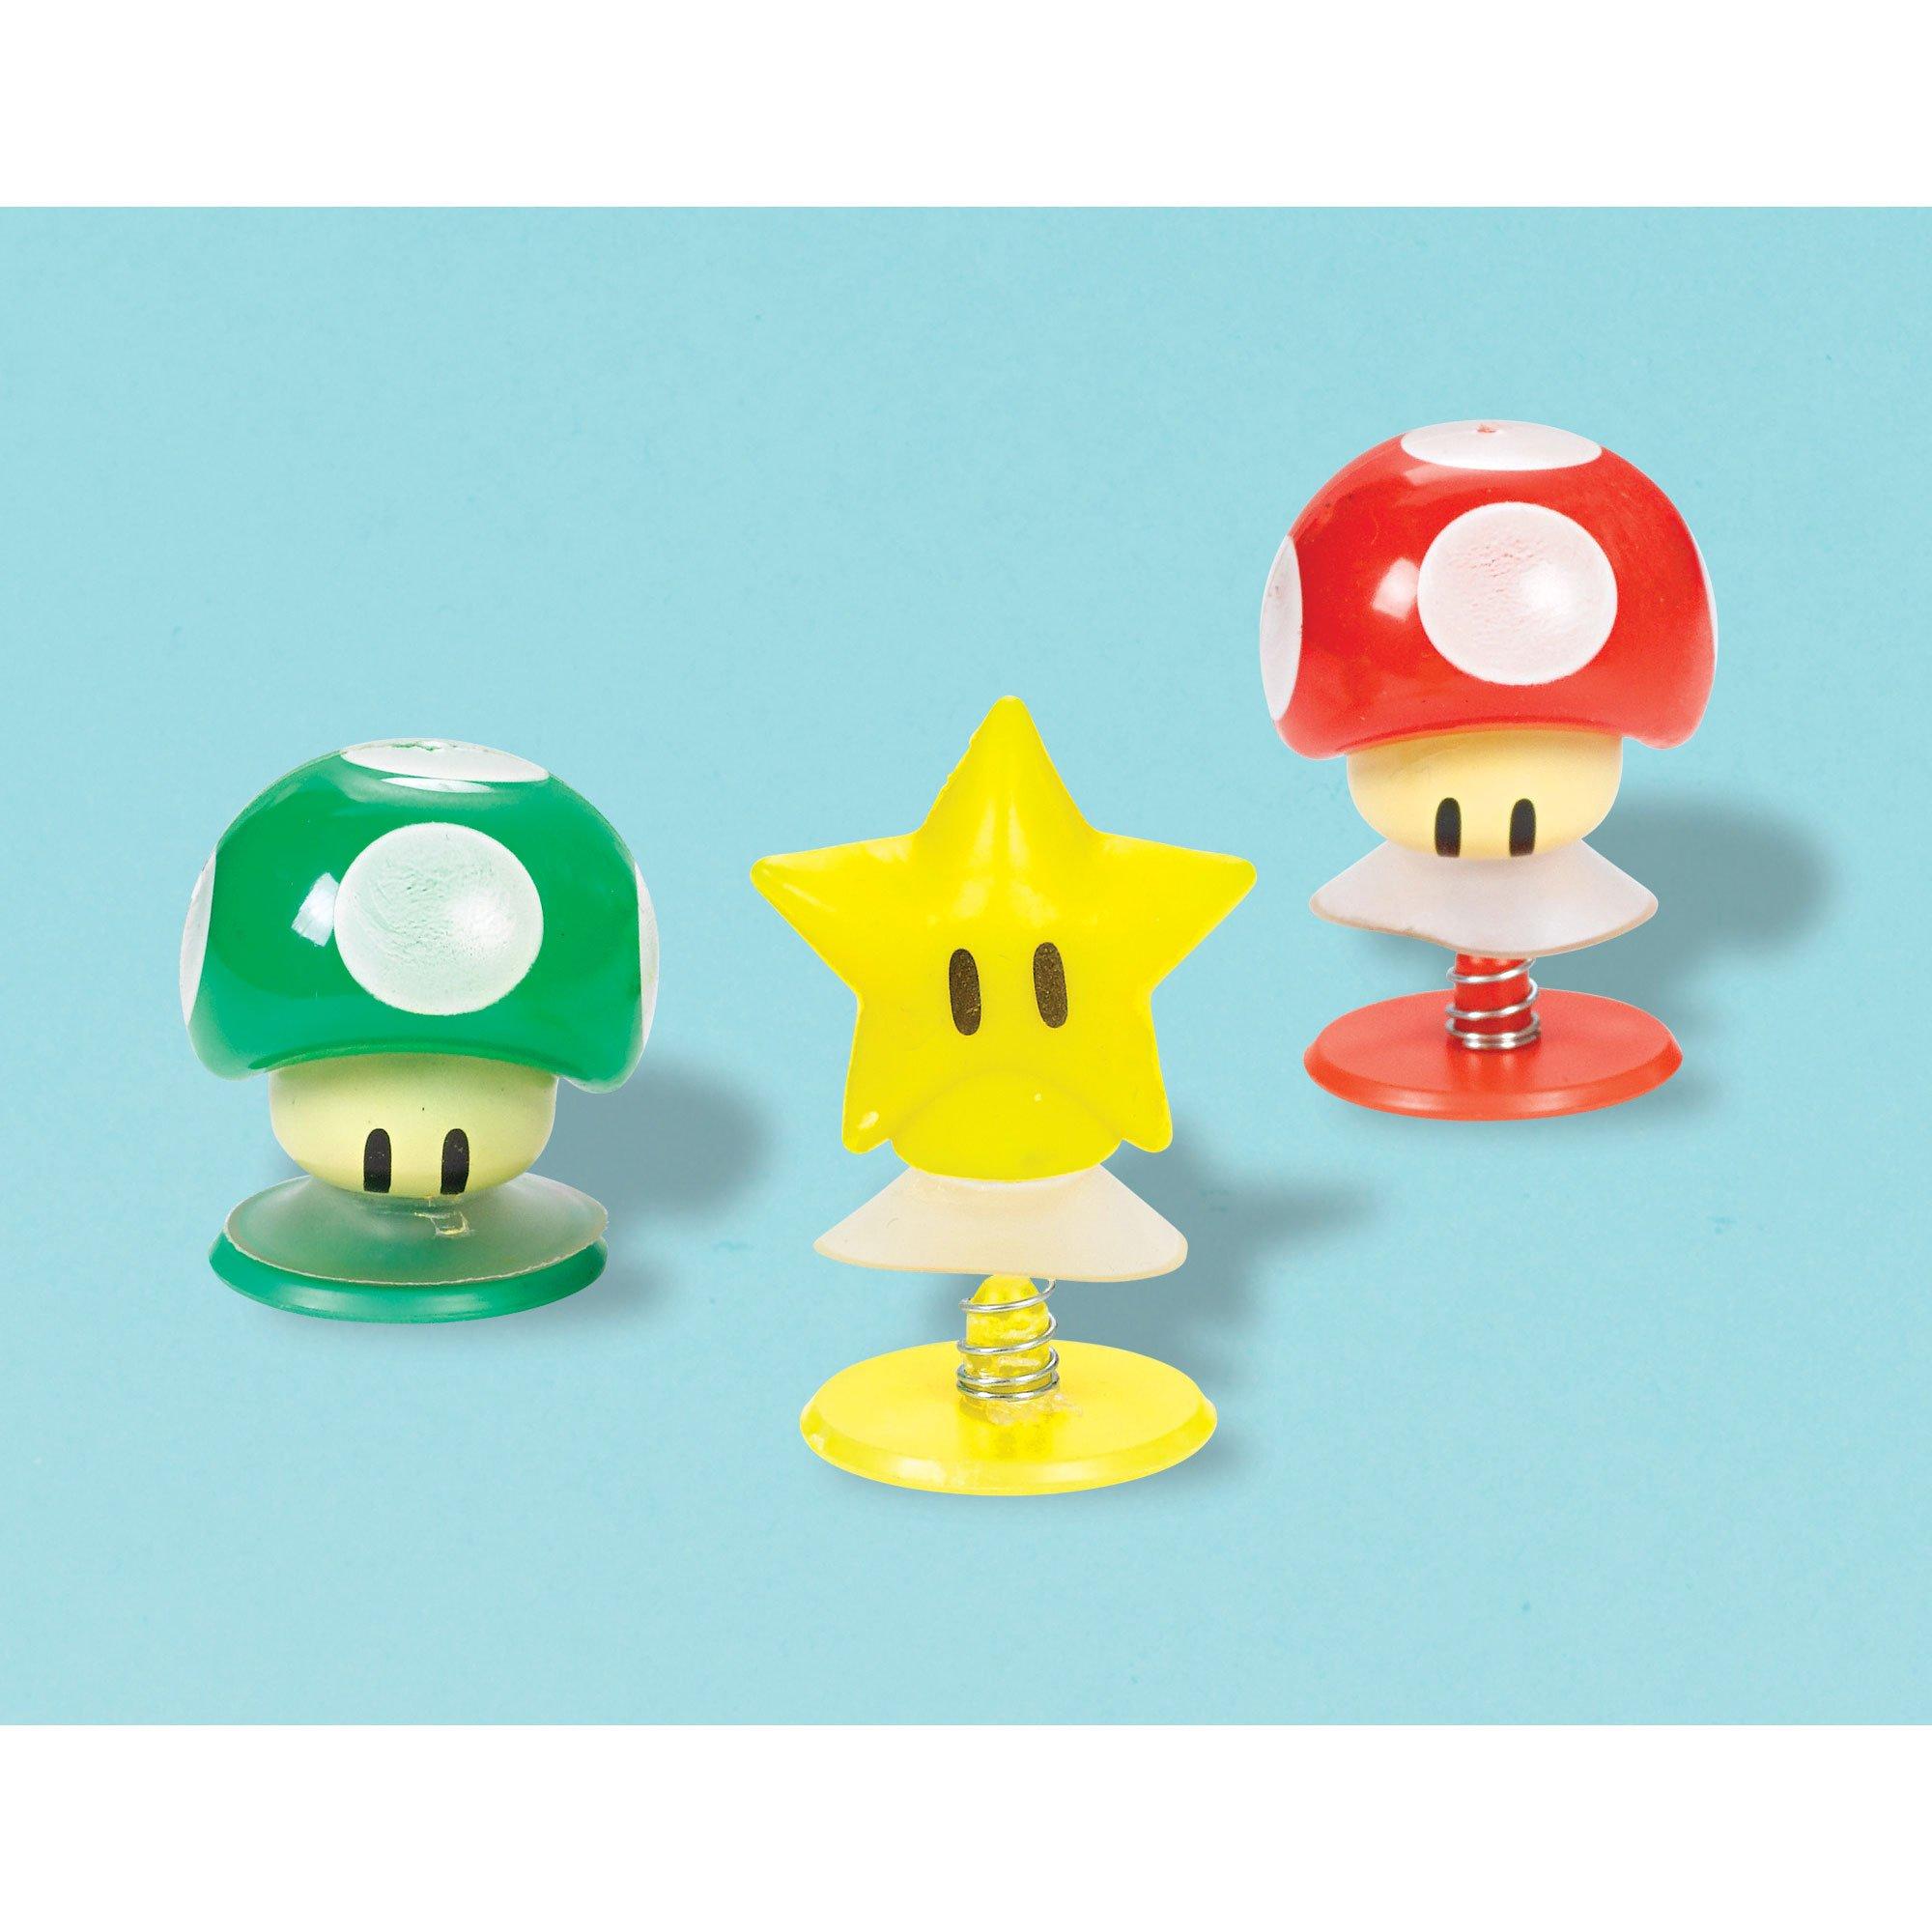 Super Mario Brothers Creature Pop-Up Favors